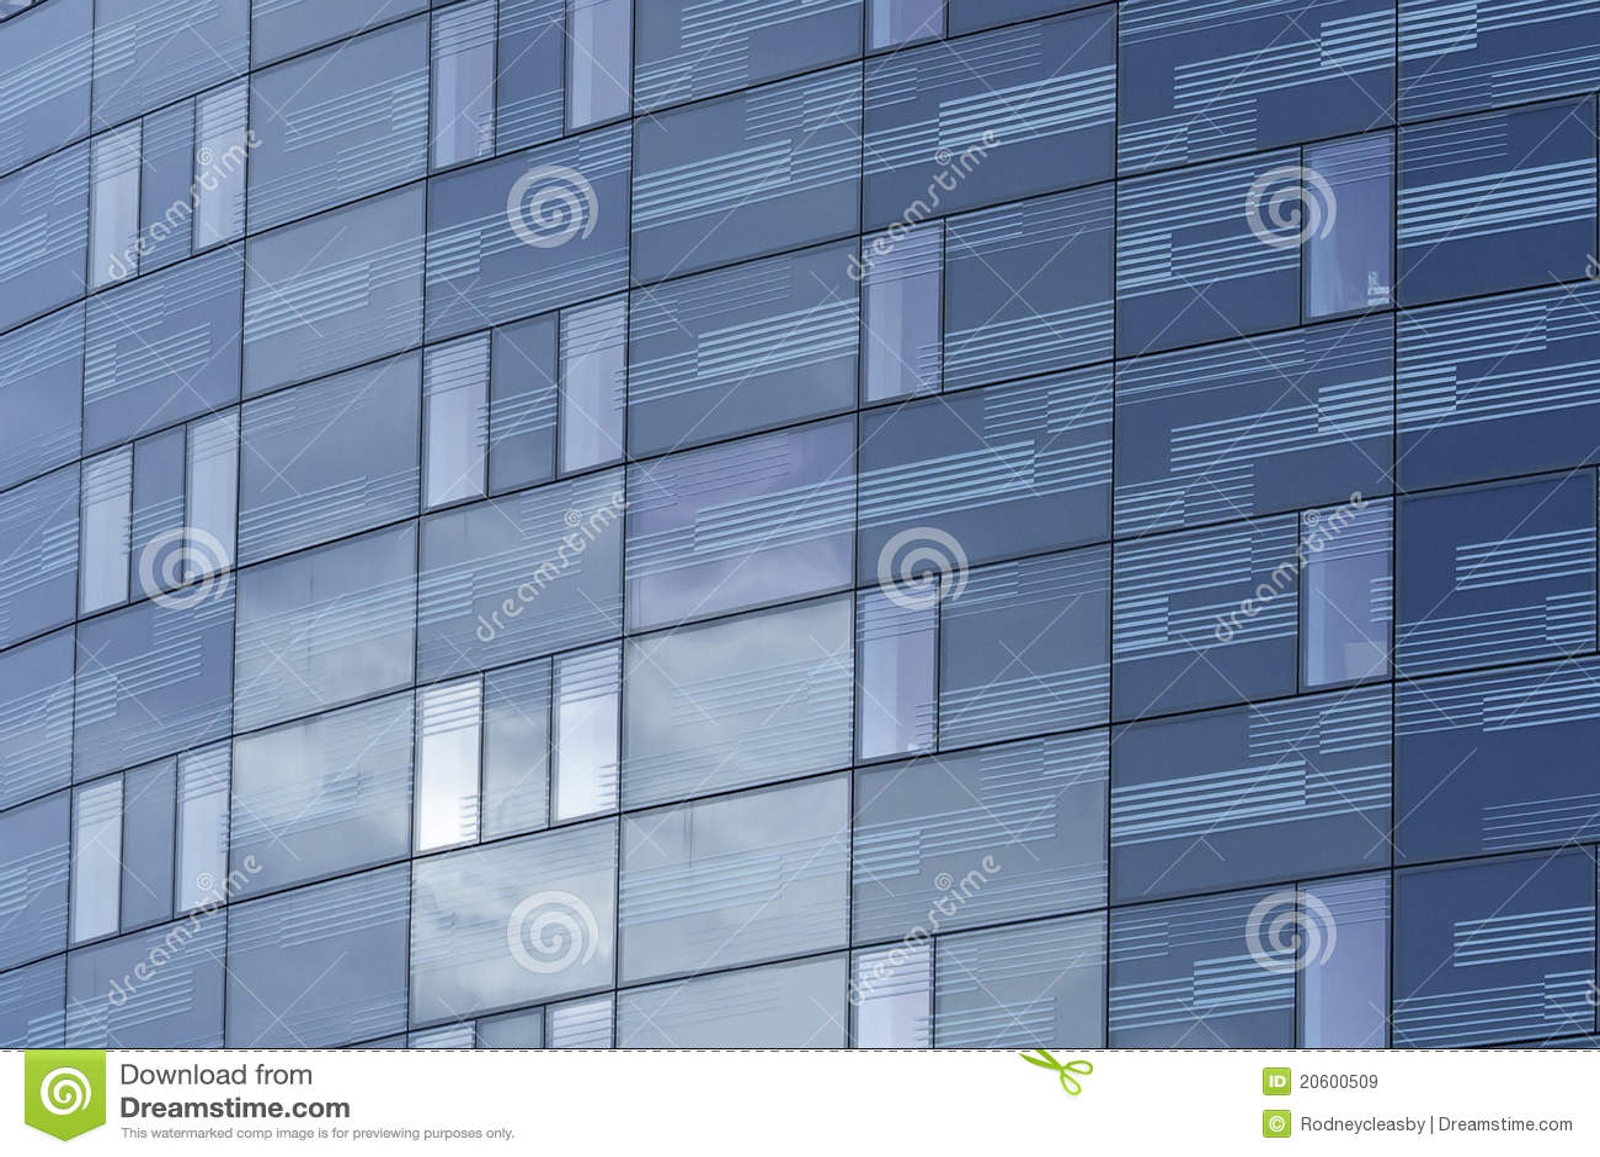 Alto bloque de oficina de la pared de cristal de la subida